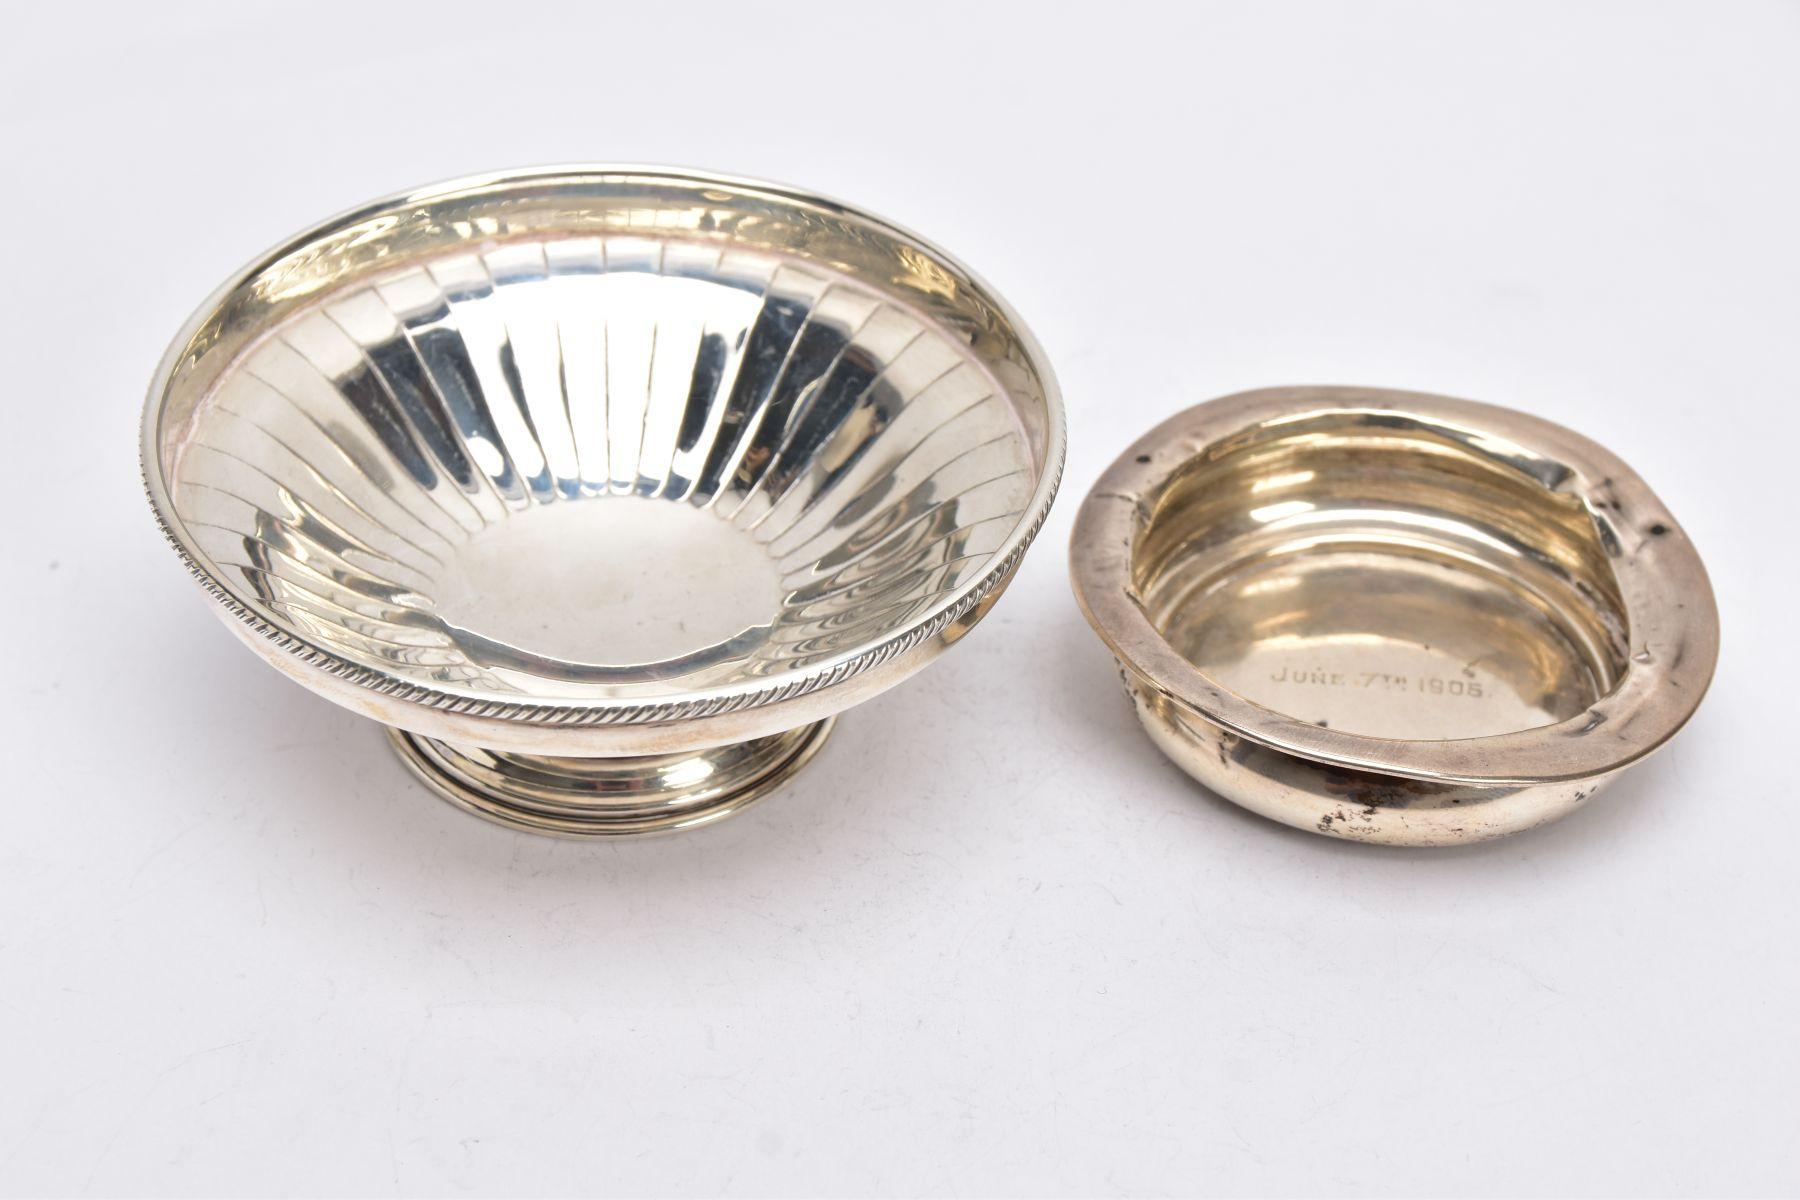 A SILVER BONBON DISH AND A SILVER DISH, the bonbon of a circular form, tapered engraved design,